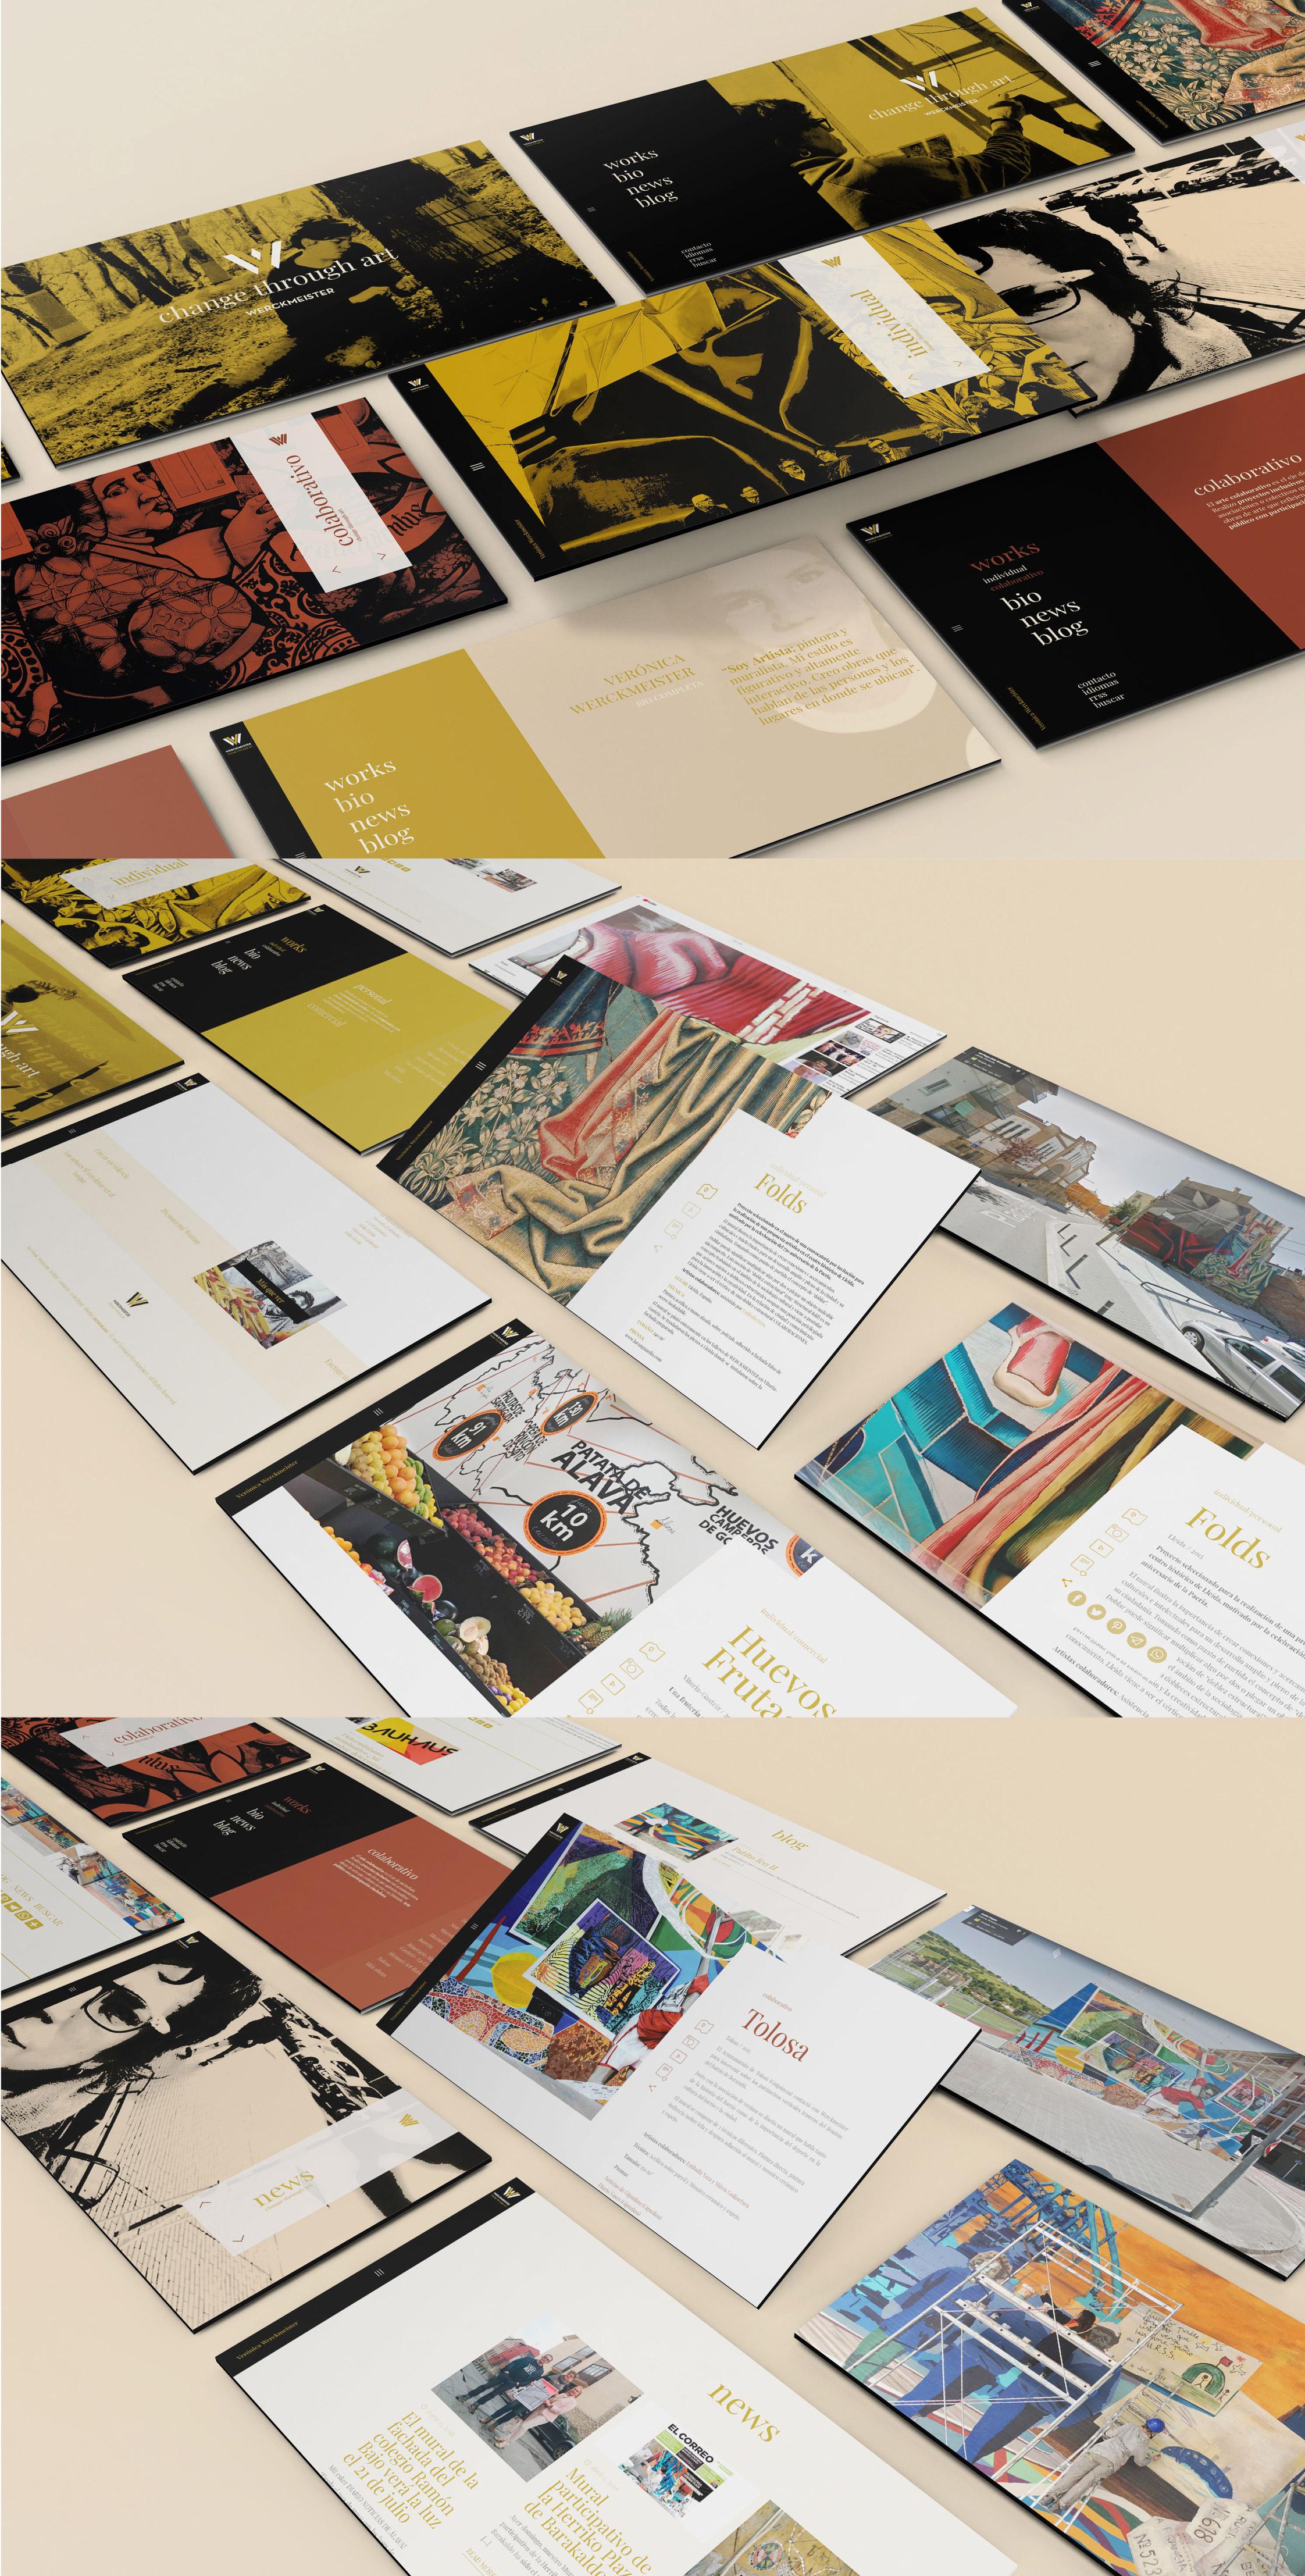 WEB VERÓNICA WERCKMEISTER by Sormen Komunikazioa, S.L. - Creative Work - $i